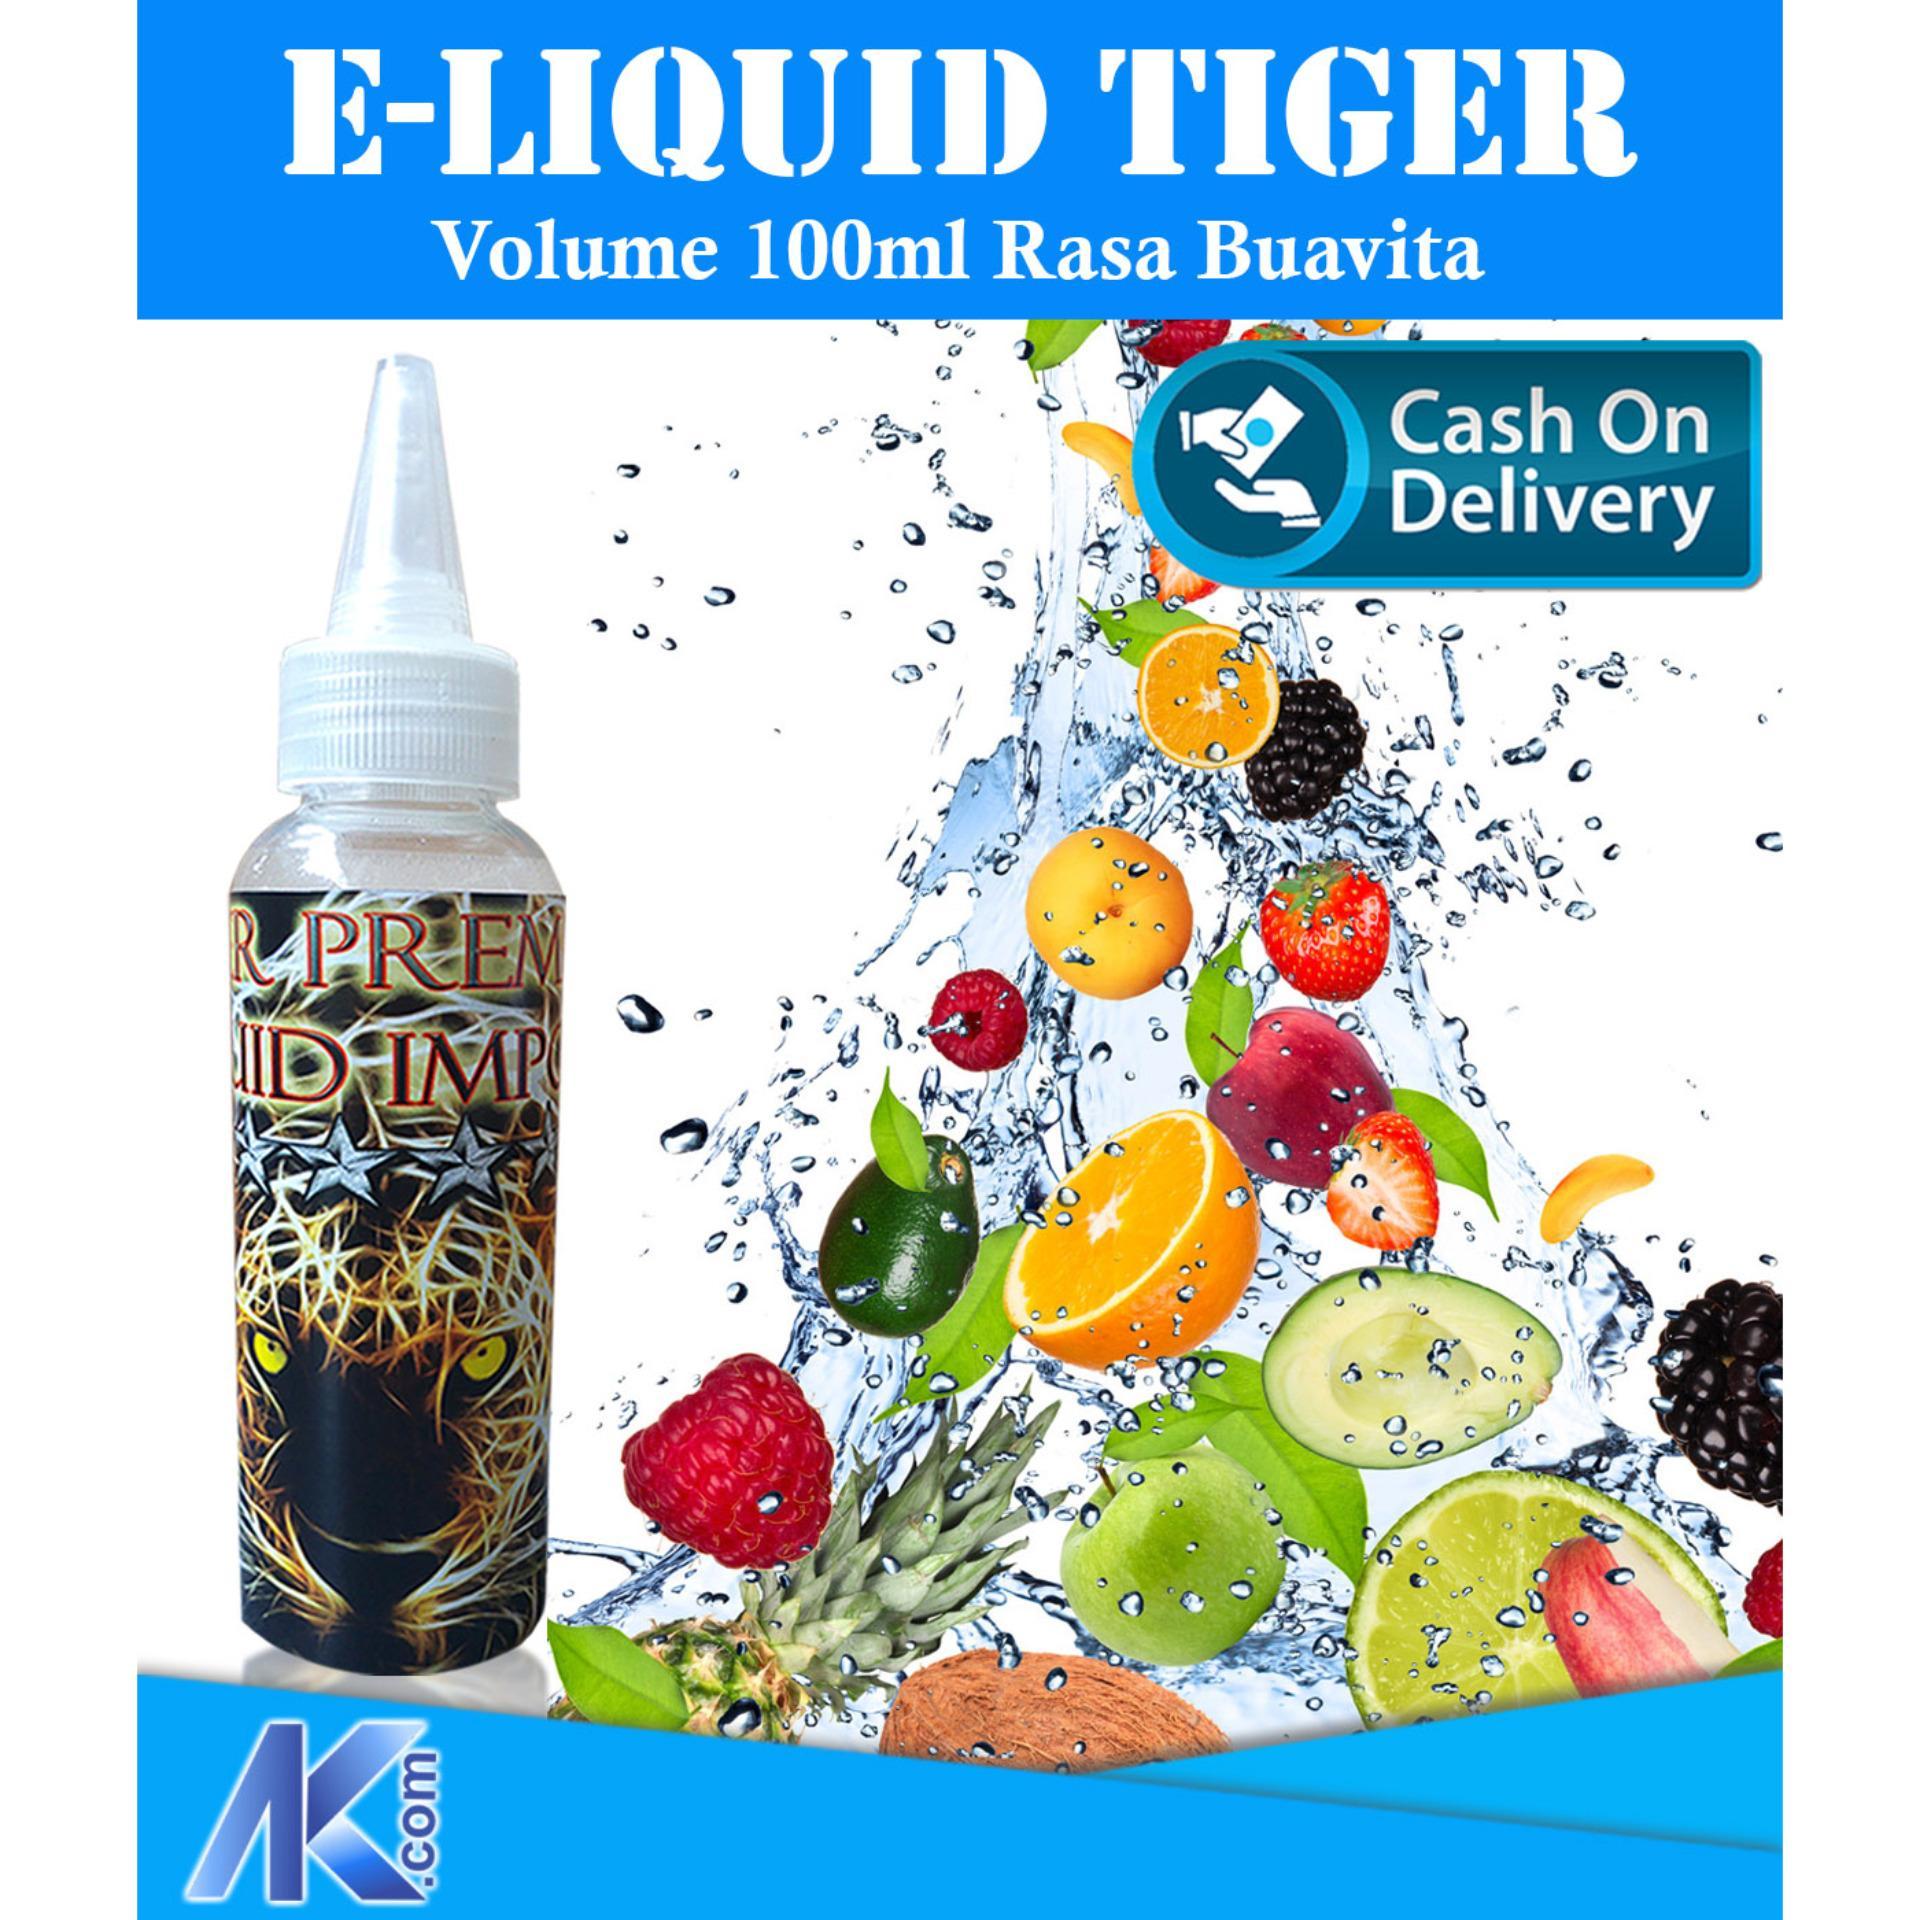 Buy Sell Cheapest Mobil Kecil Tutti Best Quality Product Deals Mollers Tuti Fruity 250ml Trans Cod Liver Fish Oil Liquid Tiger 100ml Rasa Frutti Buavita Buah Buahan